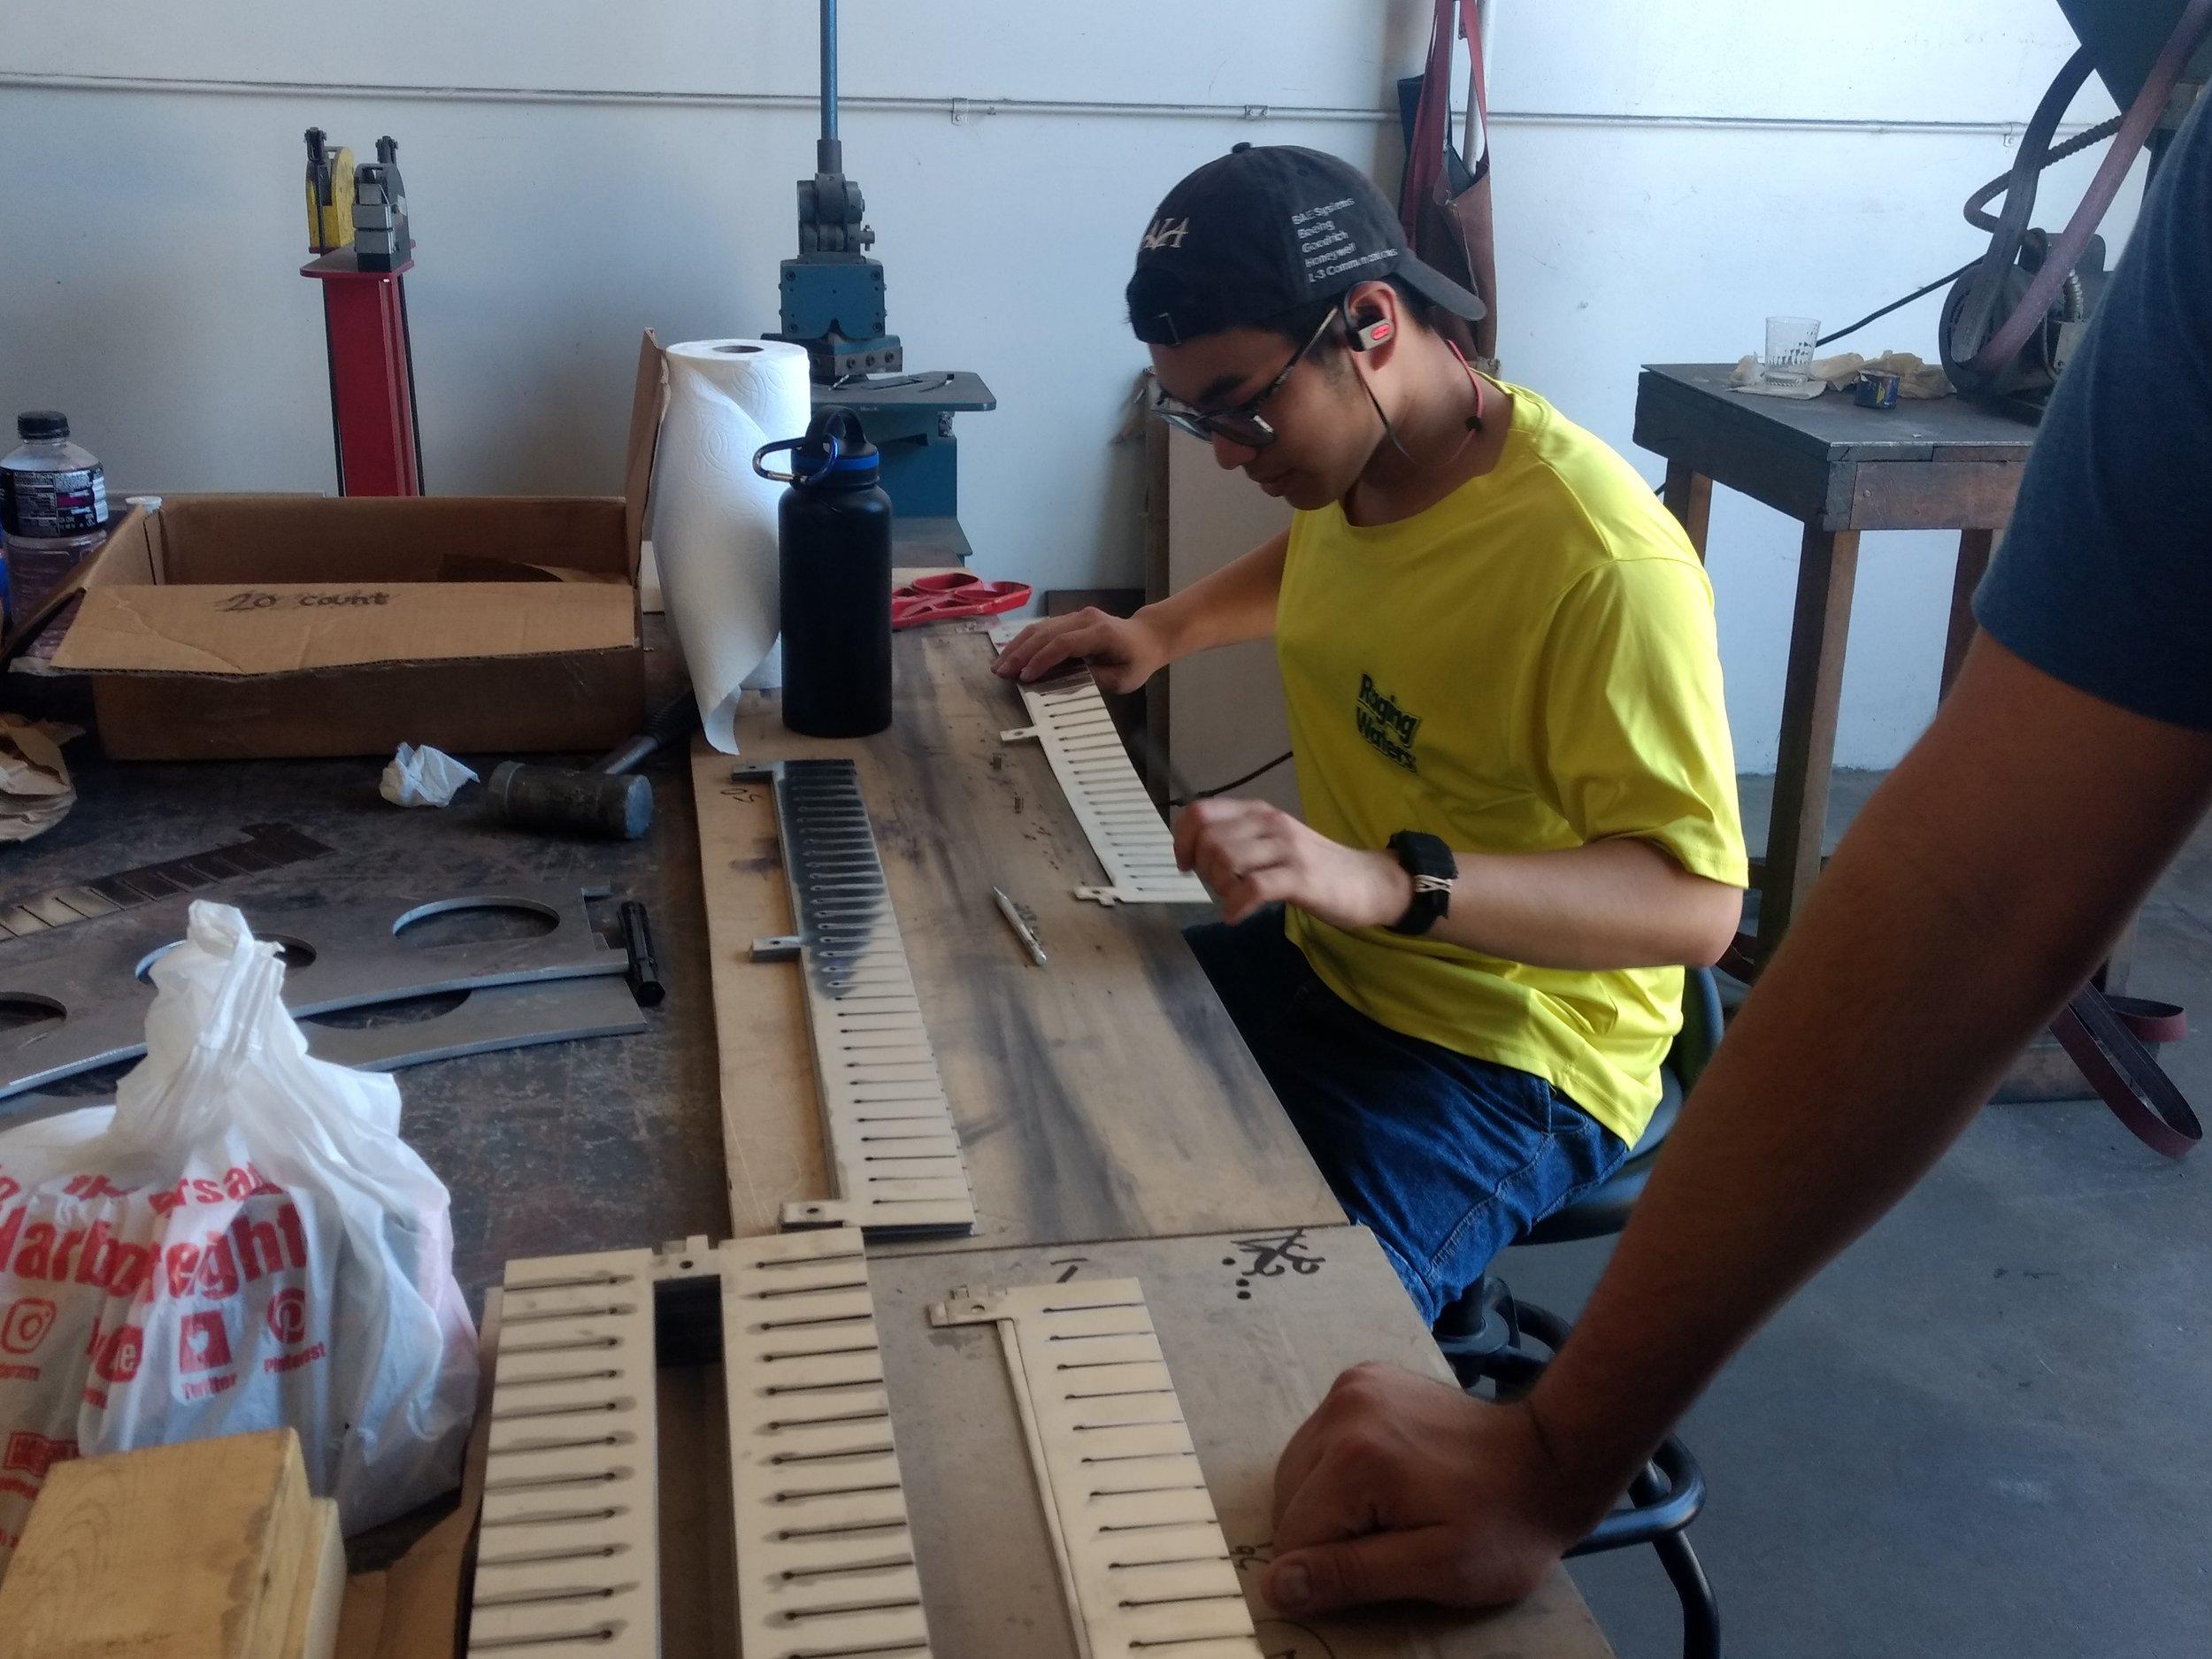 Stephen Adilukito examining parts for any damage. Photos by Brody Salazar.